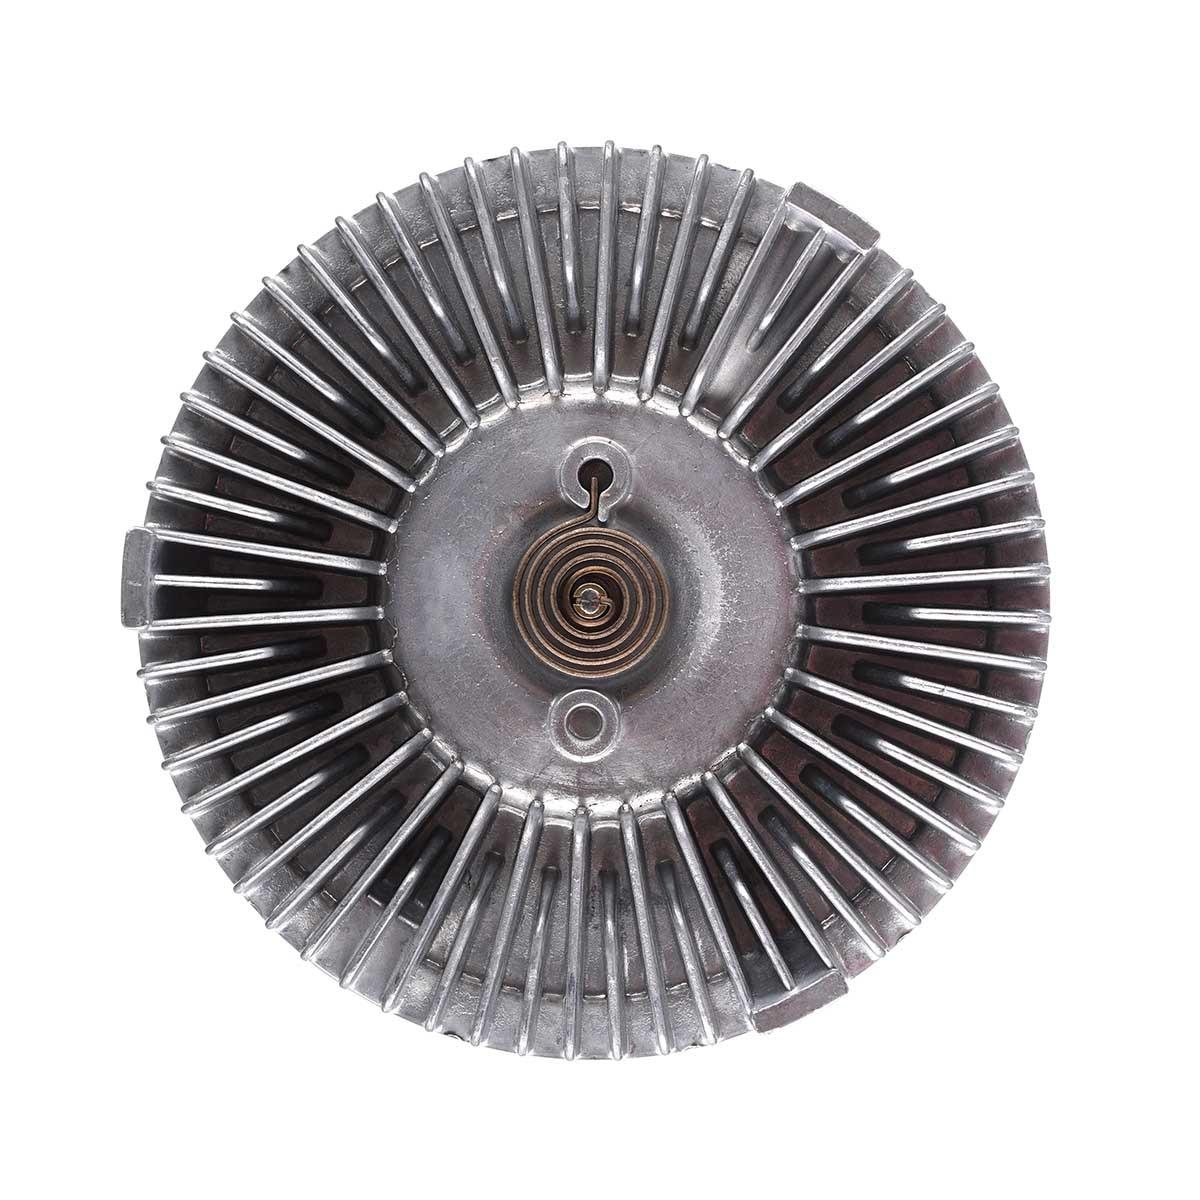 Radiator Cooling Fan Clutch For Ford Ranger Explorer Mazda B4000 Pickup Truck